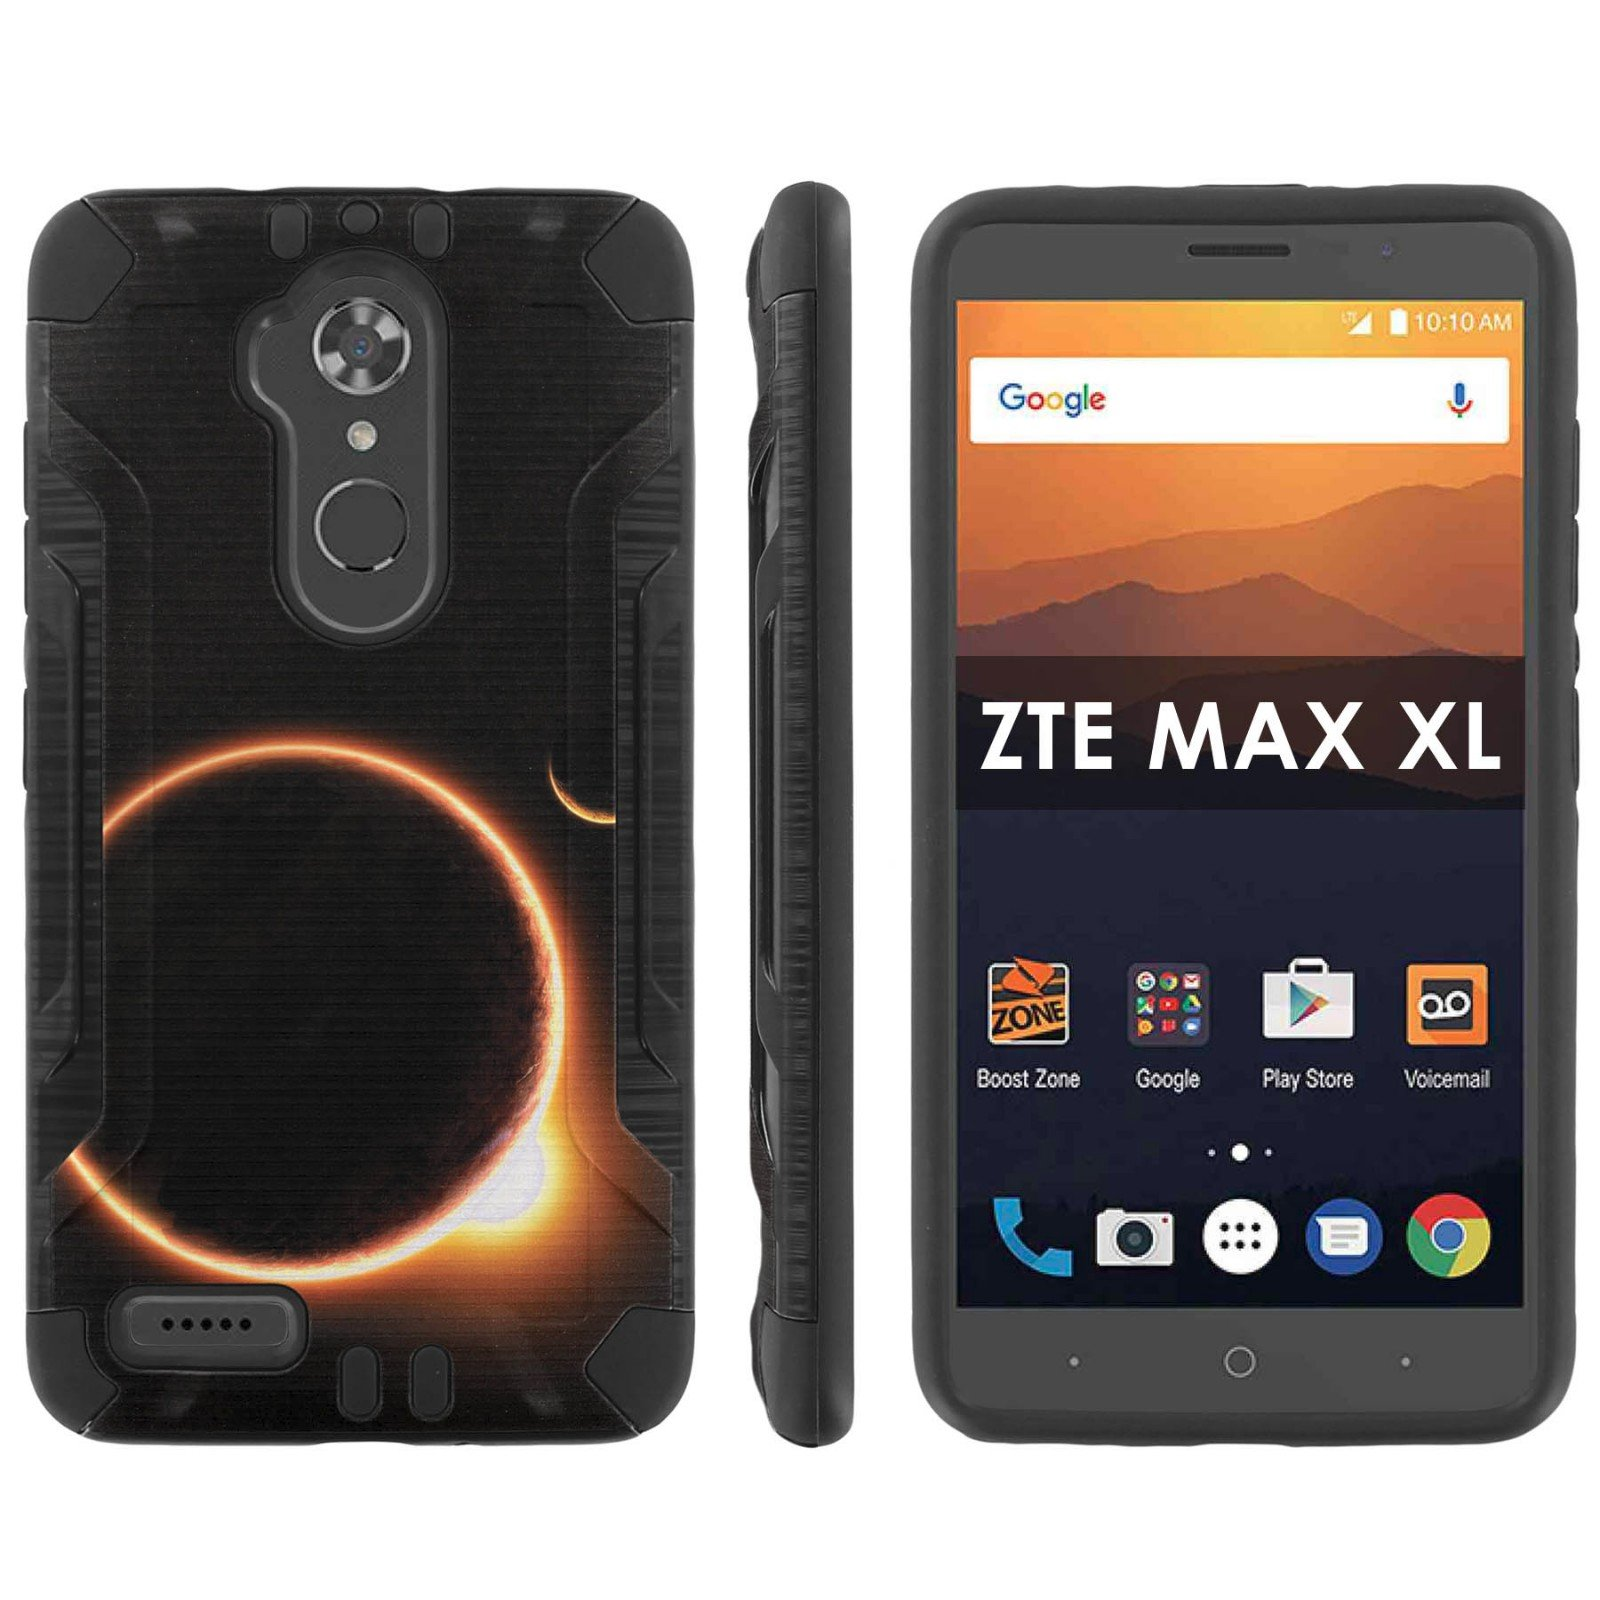 [Mobiflare] ZTE [Max XL] [Blade Max 3 Z986] [Max Blue] Shock Proof [Black/Black] Heavy Duty Armor Phone Case - [Solar Eclipse] for ZTE [Max XL] [Blade Max 3 Z986] [Max Blue] [6'' Screen]